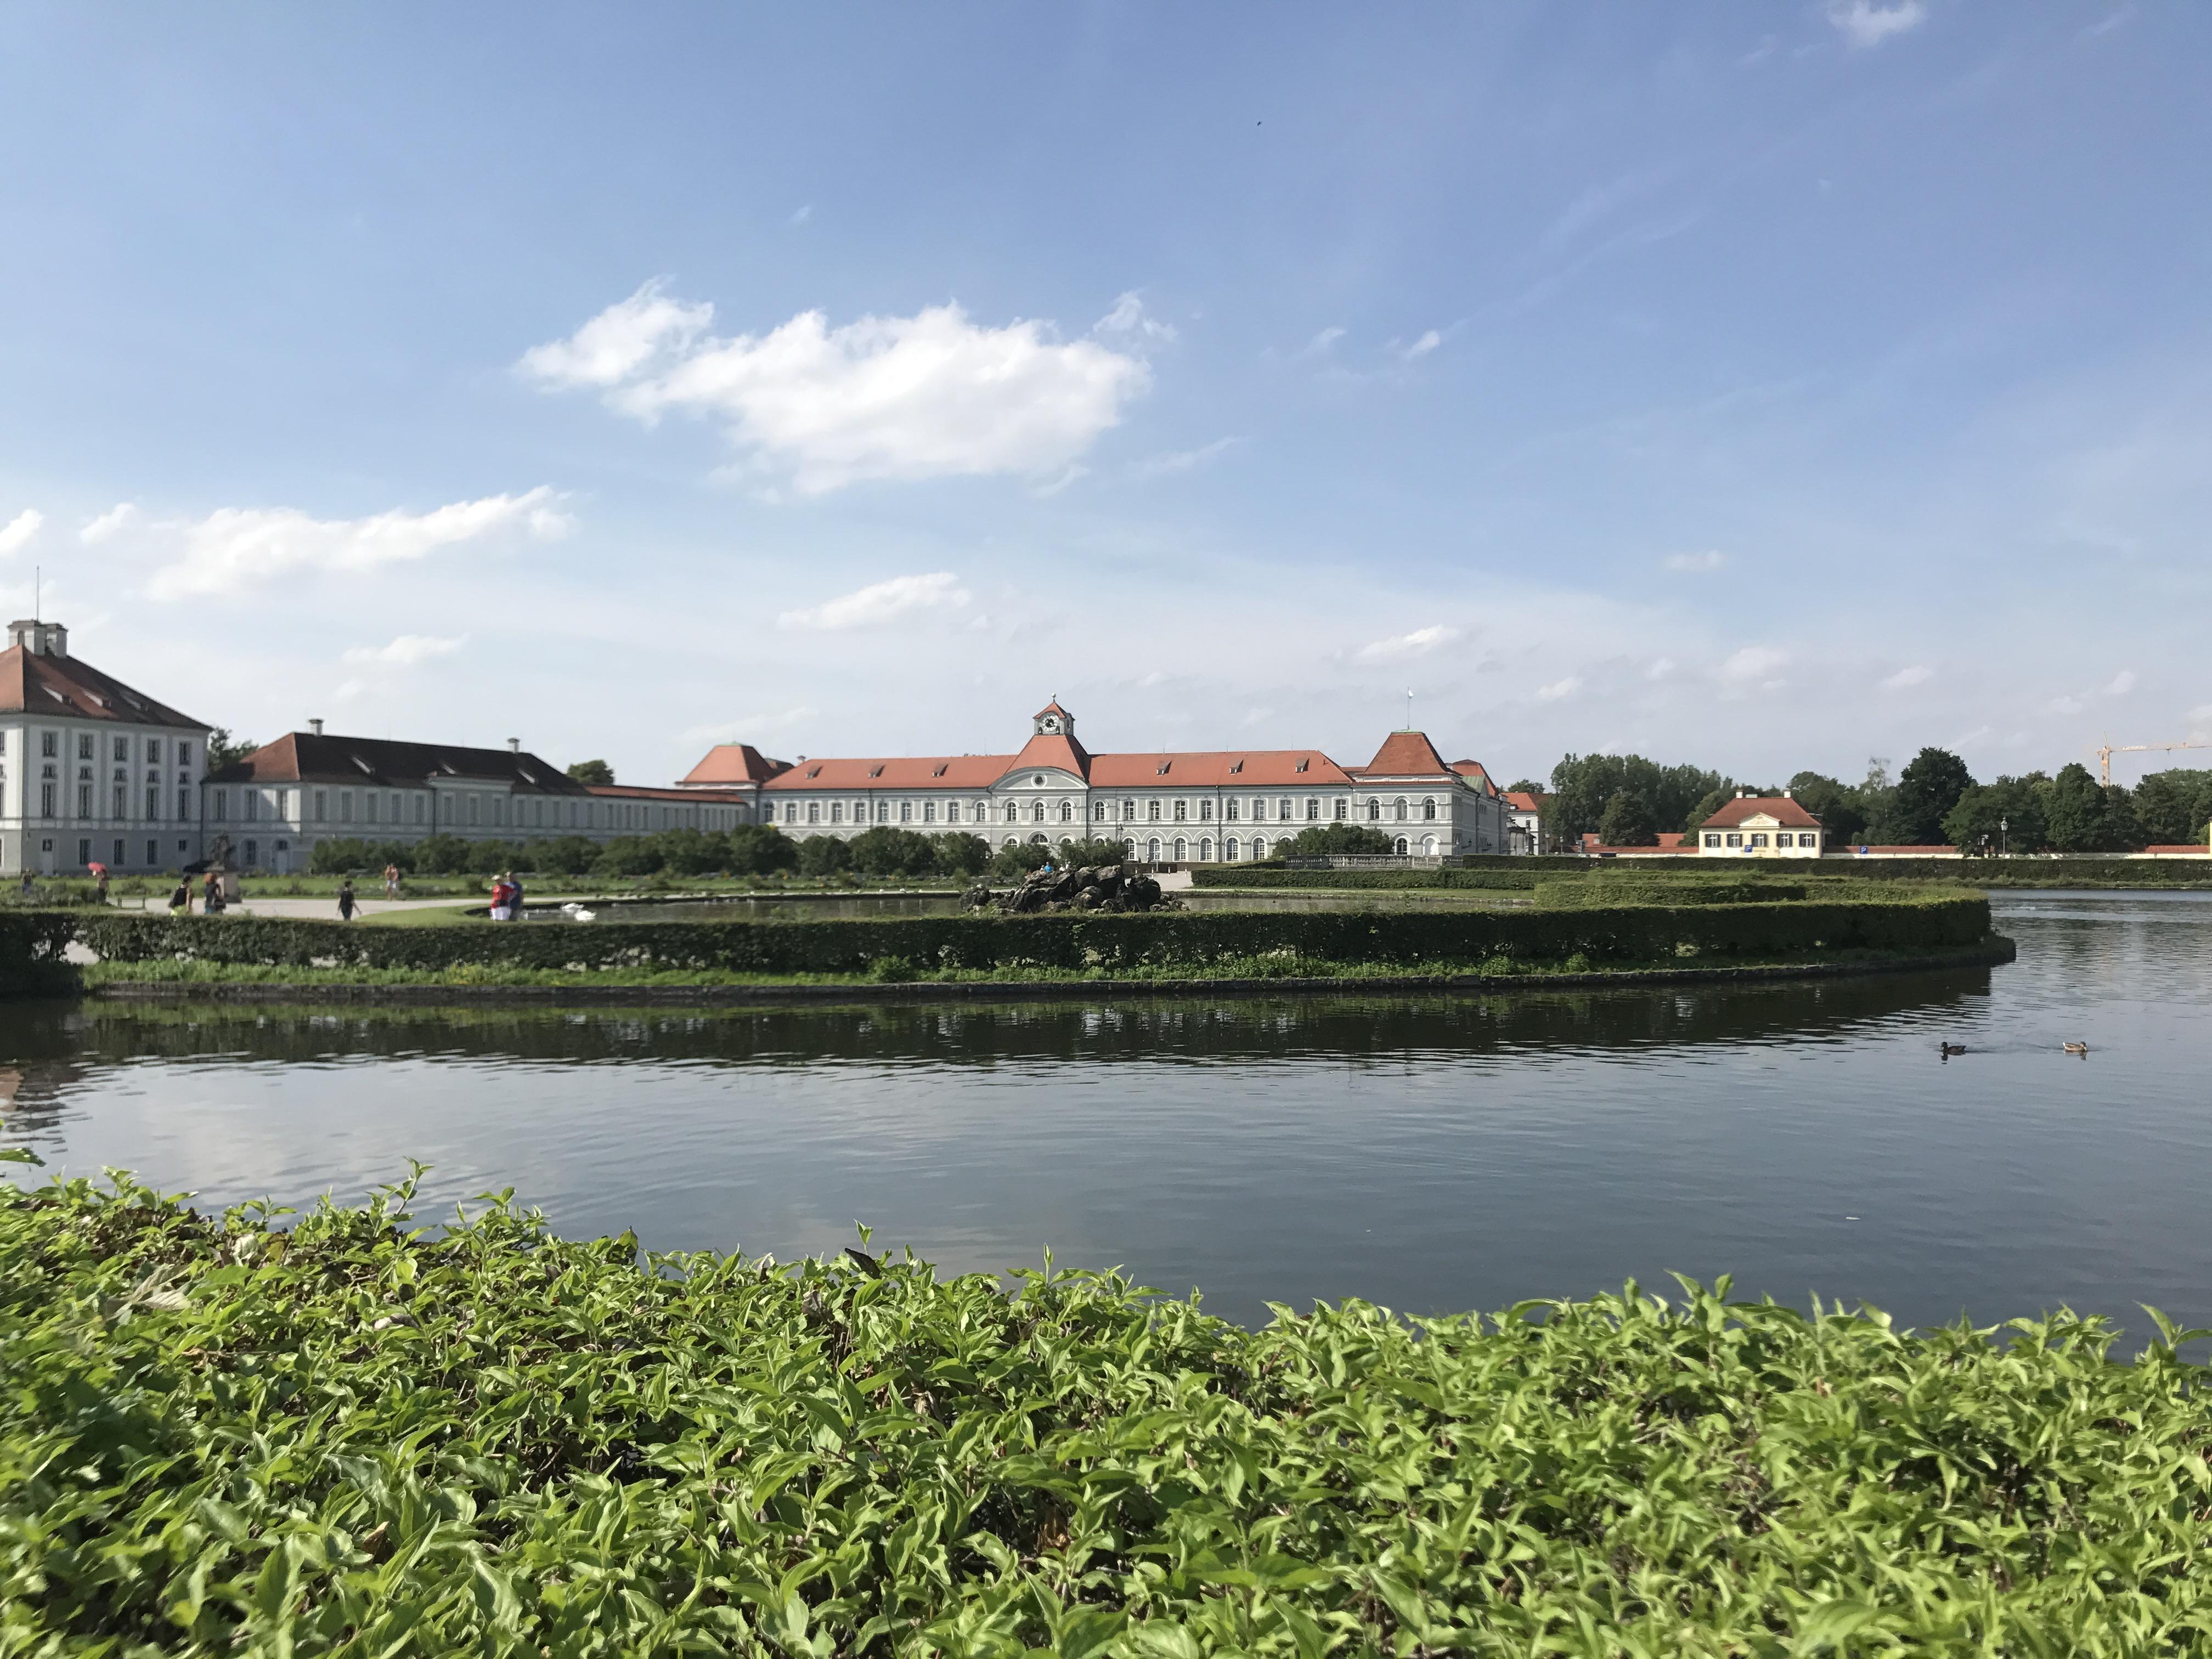 Nynphenburg Monaco di Baviera